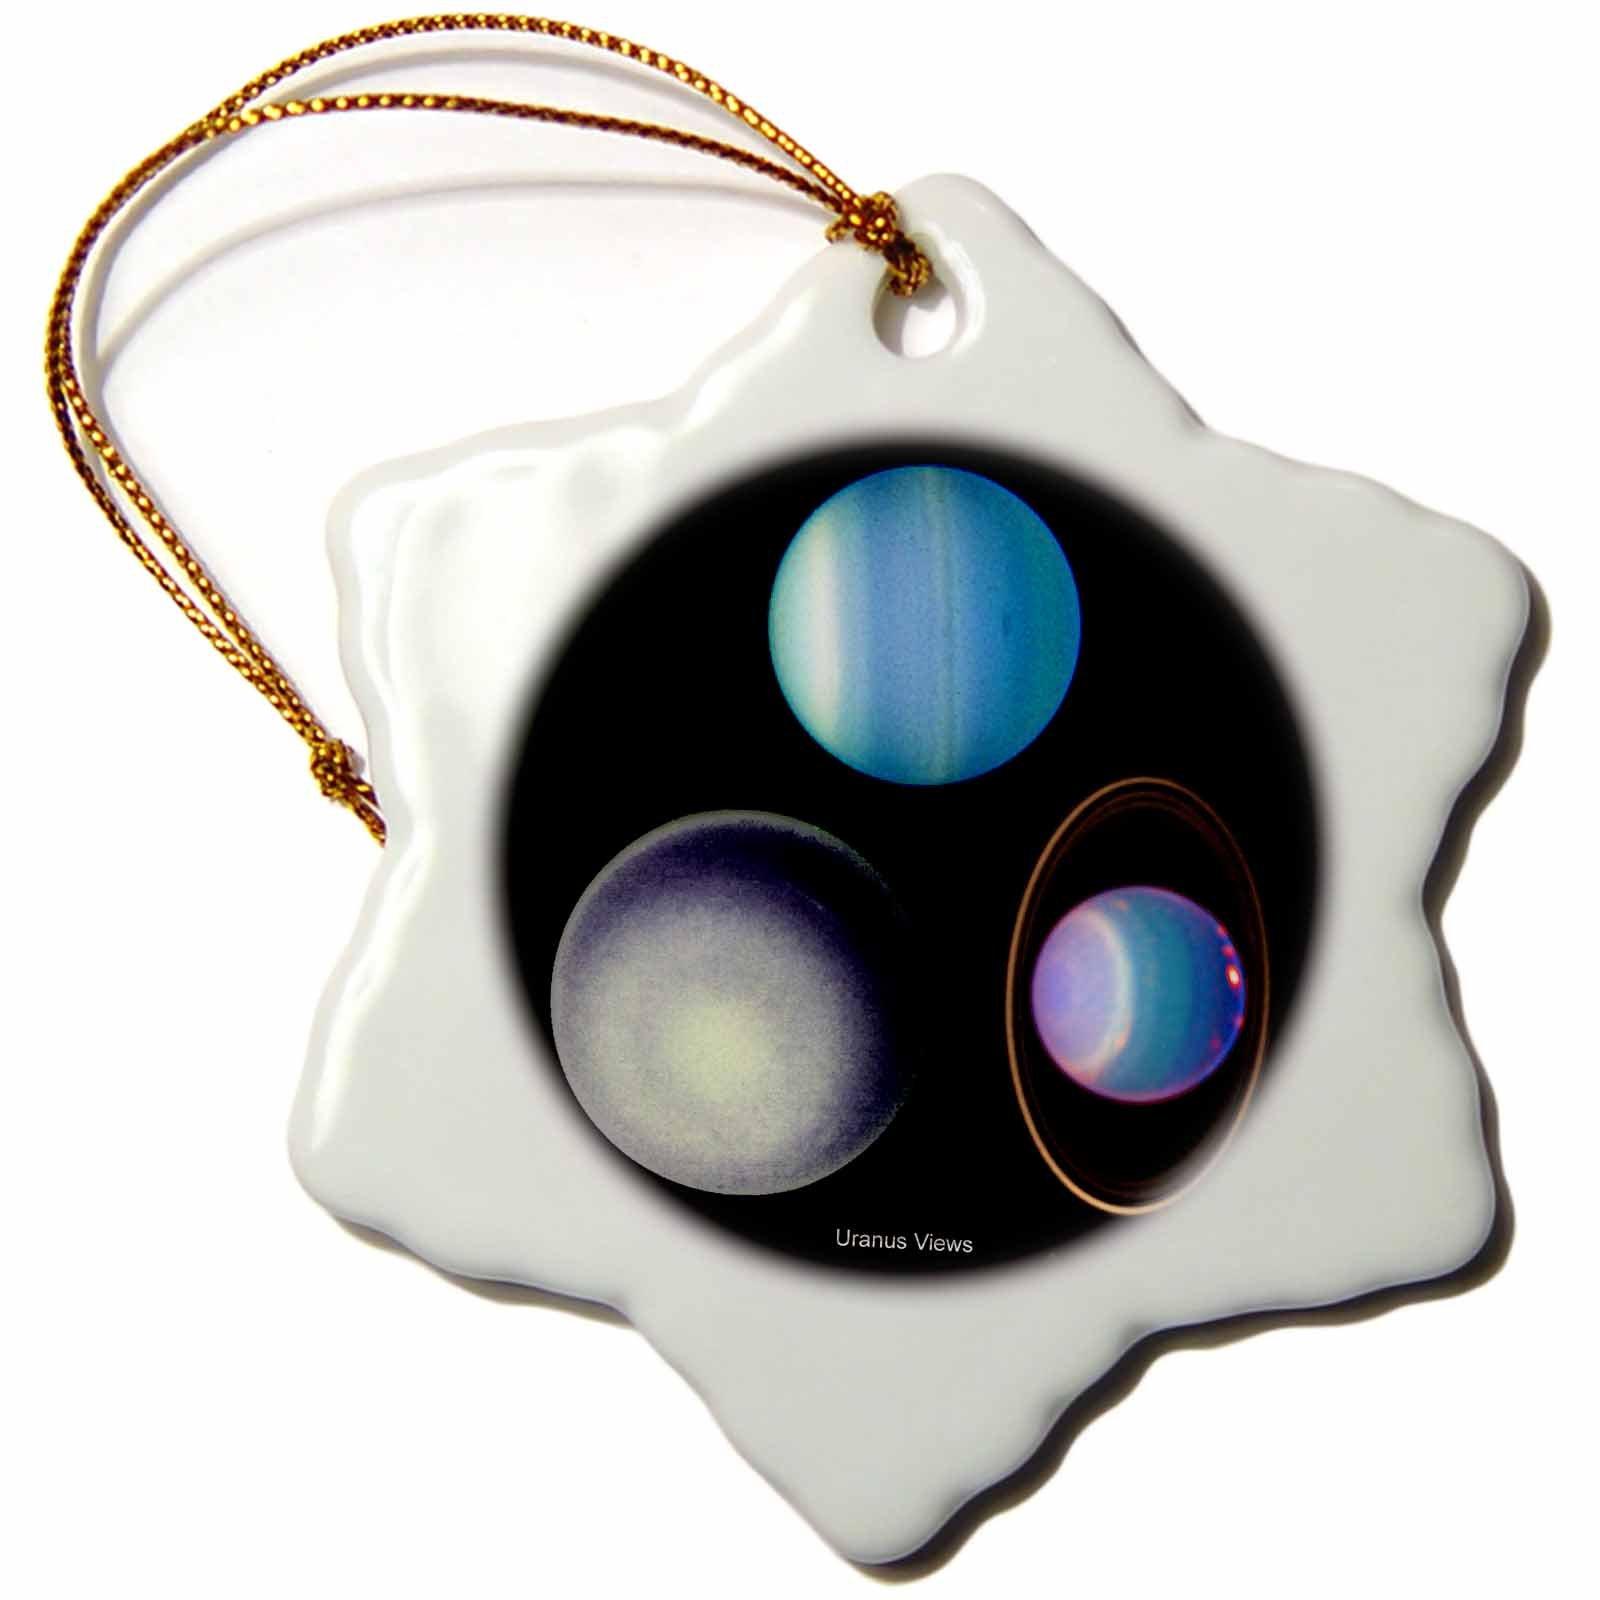 3dRose orn_76837_1 Solar System Uranus Views Snowflake Porcelain Ornament, 3-Inch